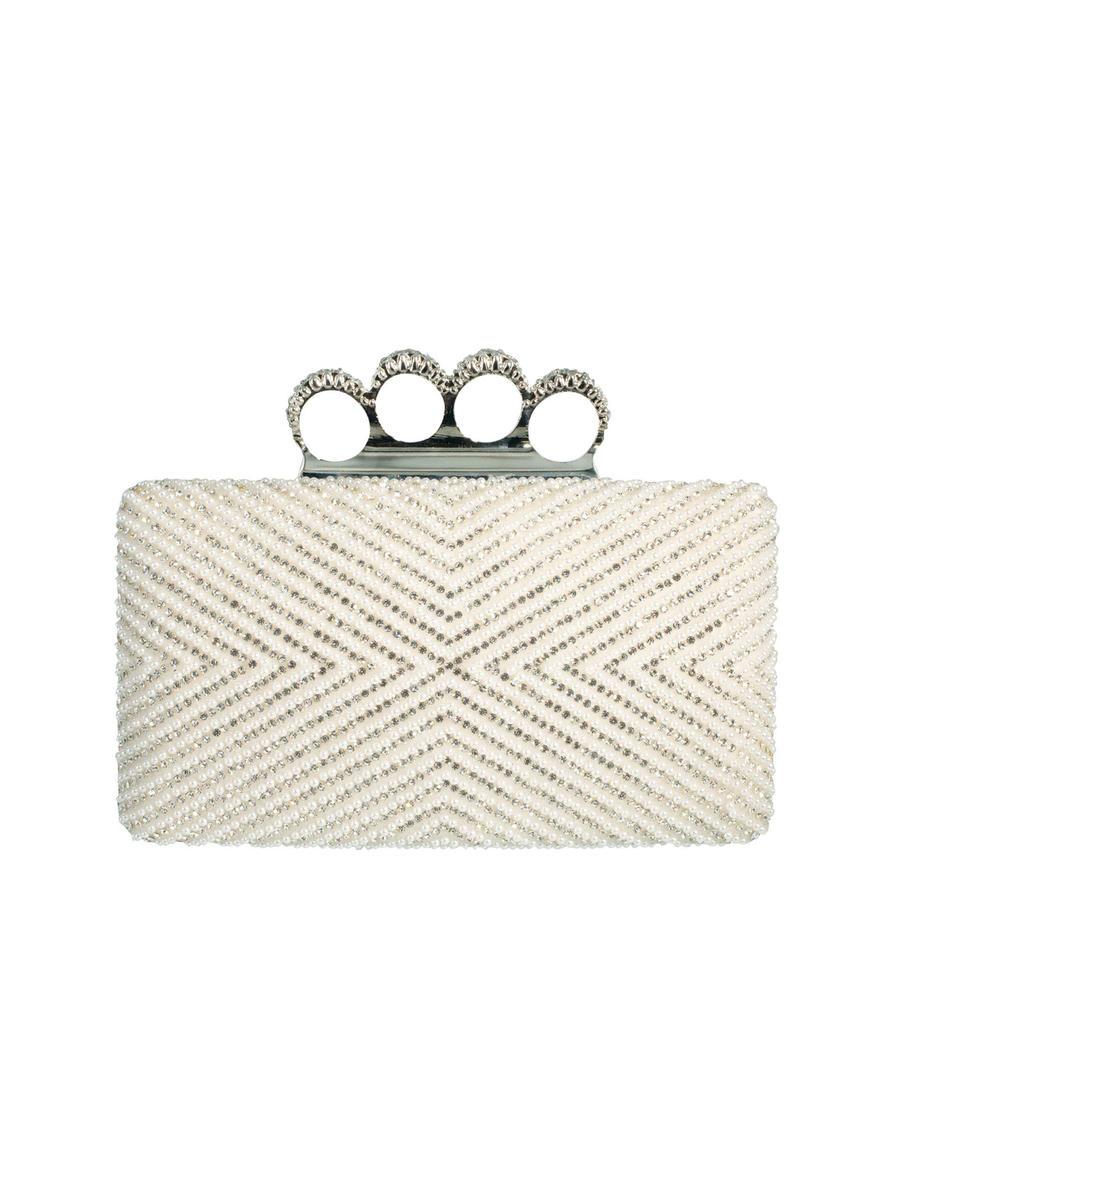 Rhinestone & Pearl Metal Frame Clutch